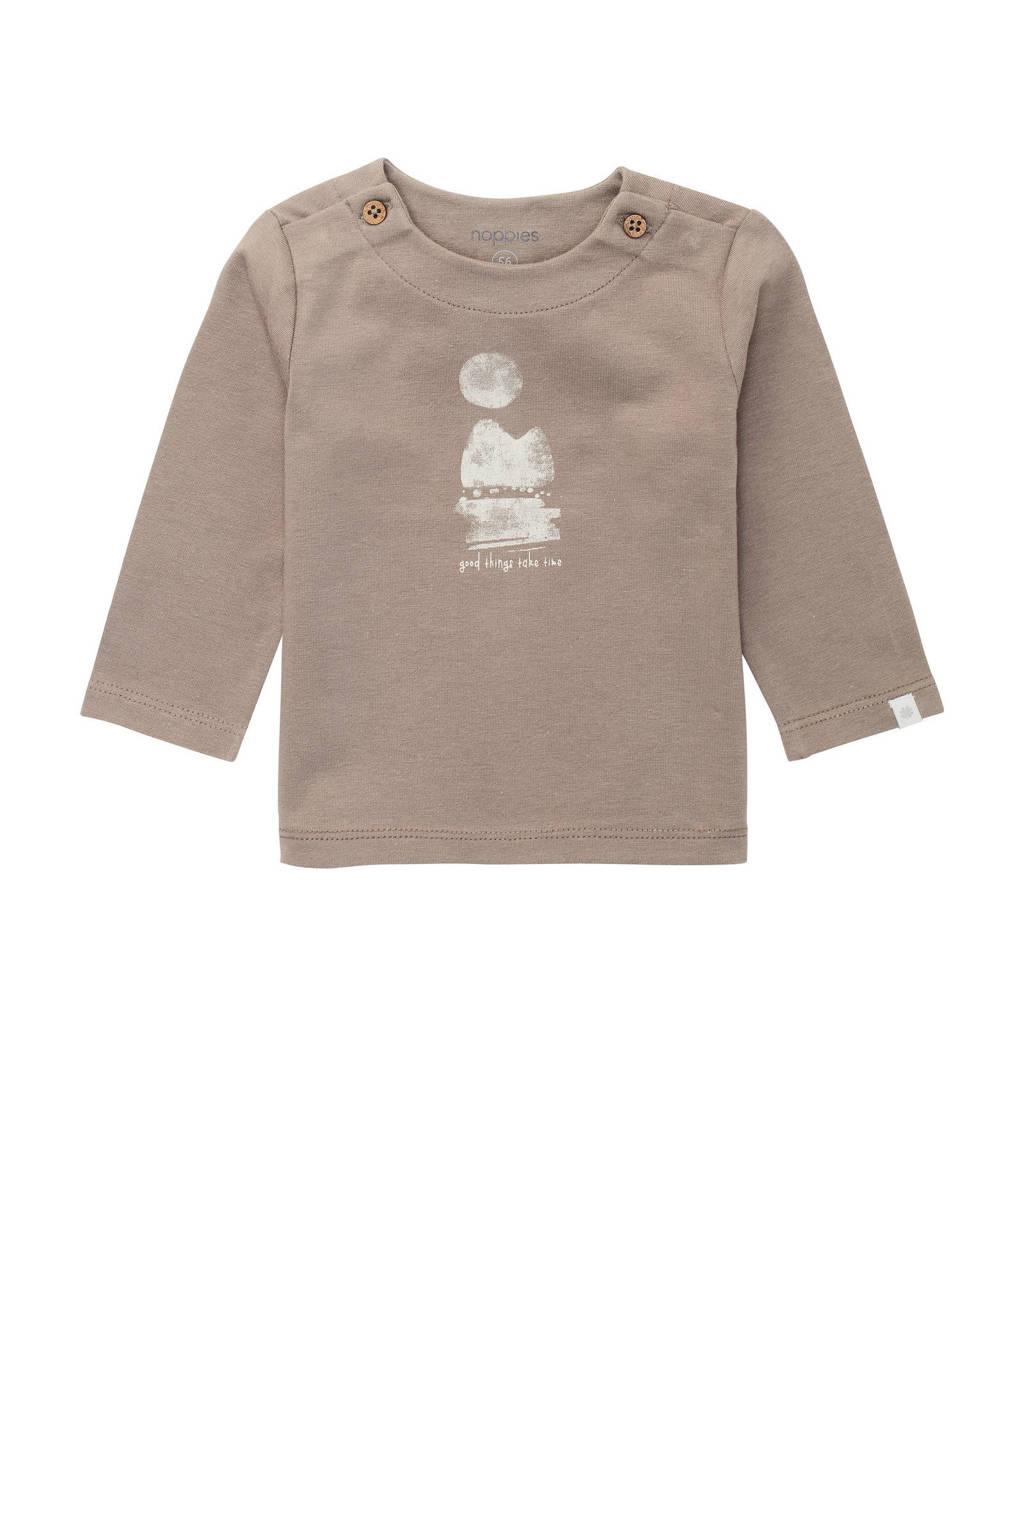 Noppies baby longsleeve Ribera met printopdruk bruin, Bruin